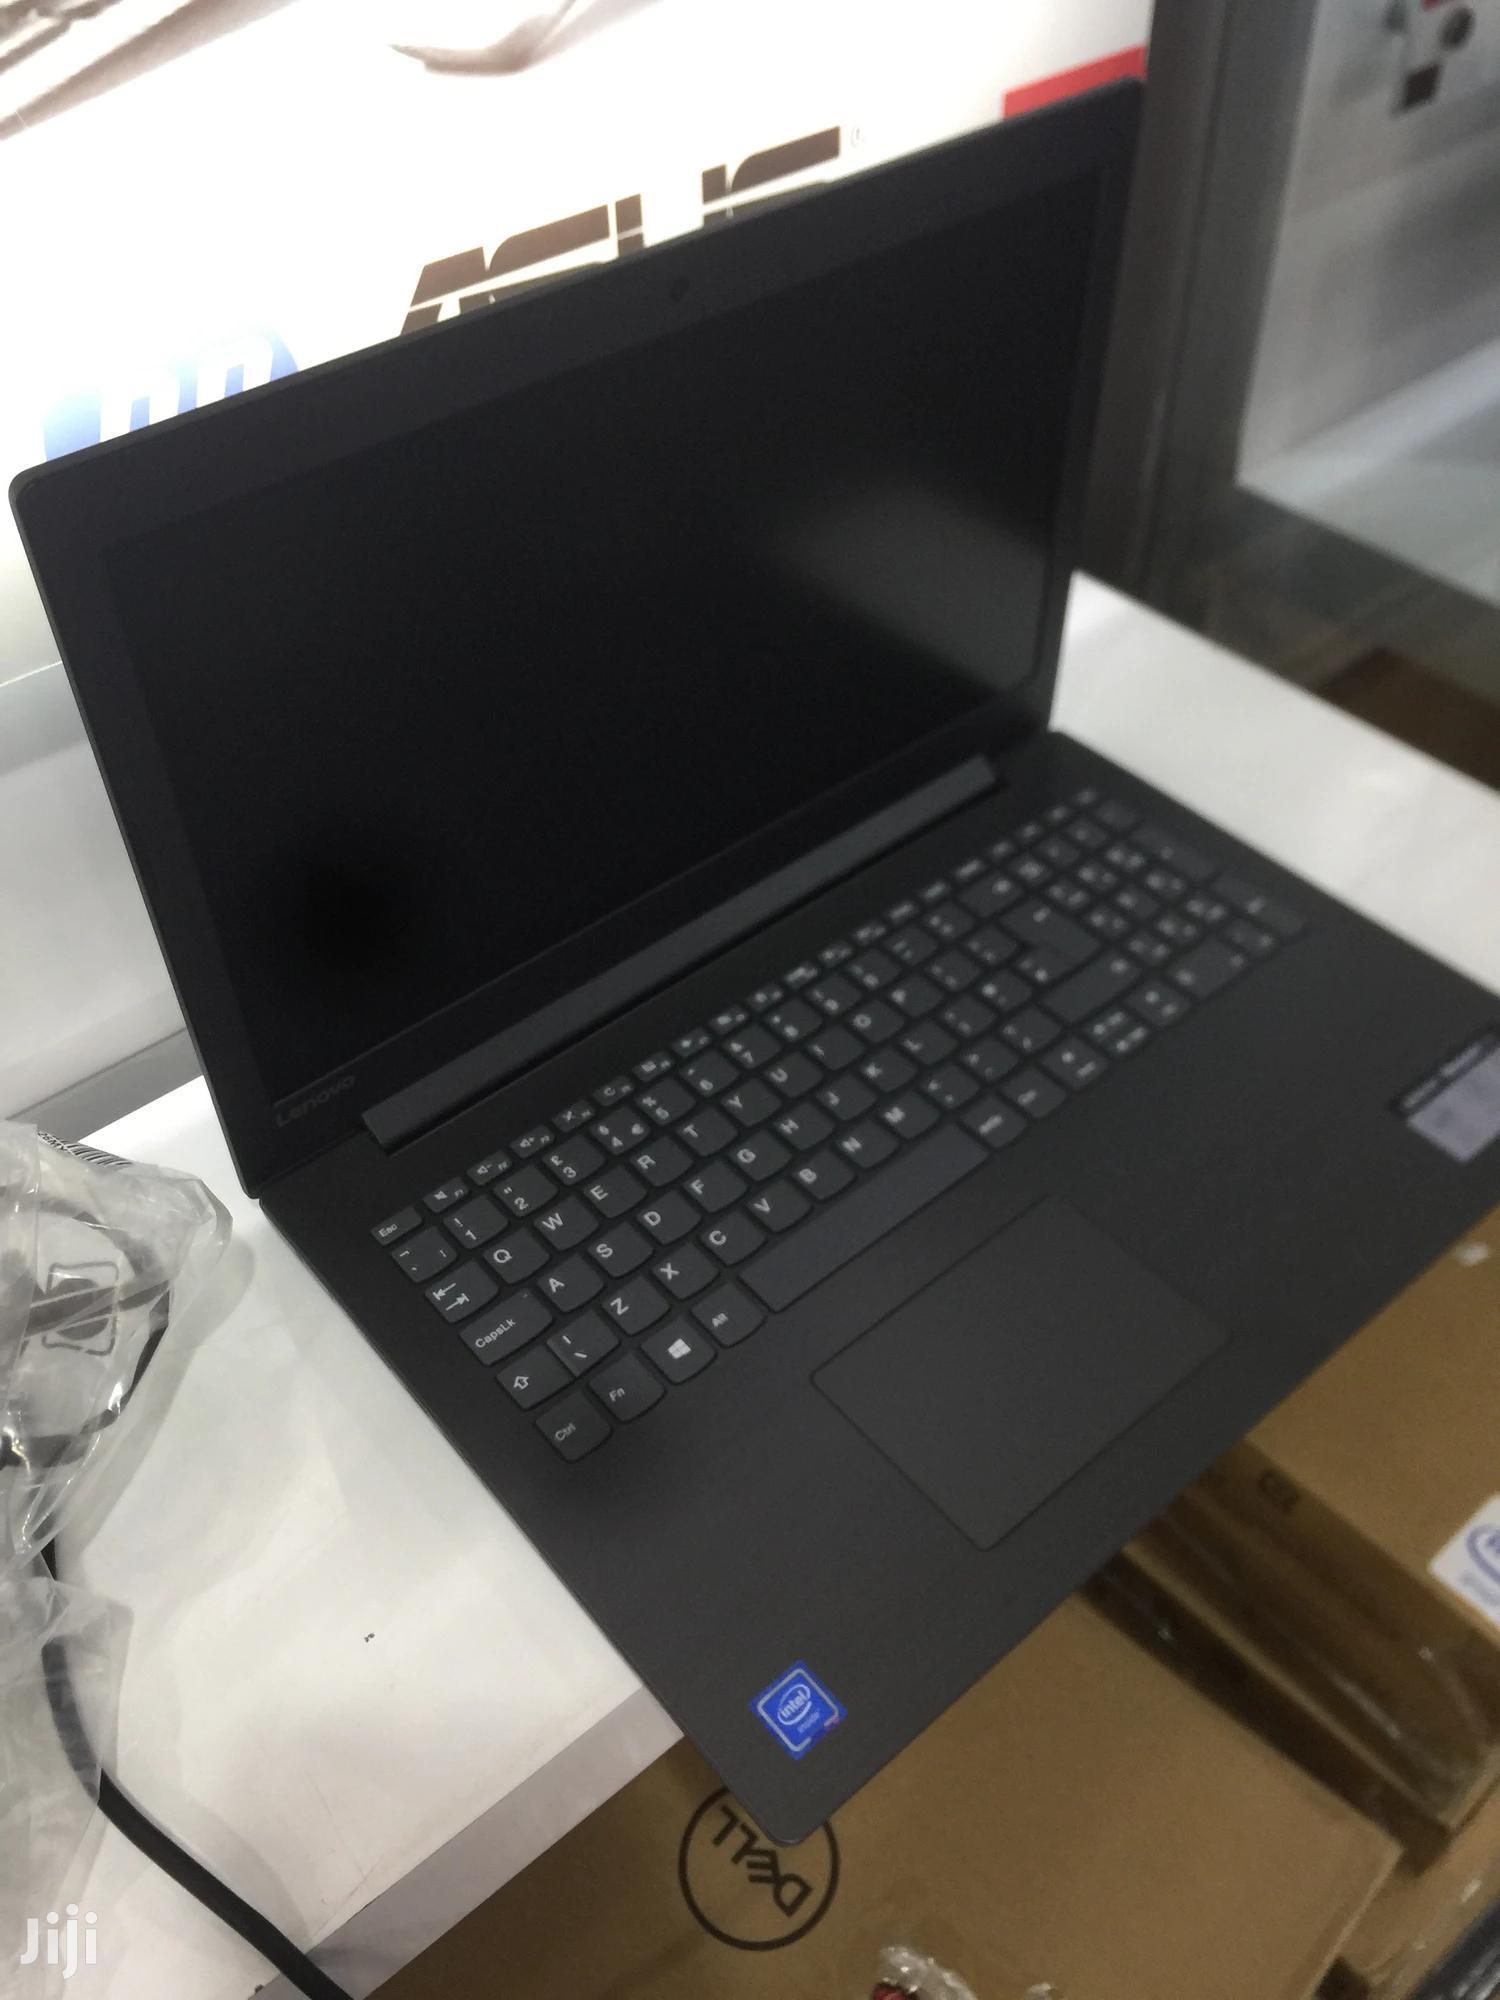 New Laptop Lenovo IdeaPad 130 4GB Intel Celeron 1T | Laptops & Computers for sale in Accra Metropolitan, Greater Accra, Ghana